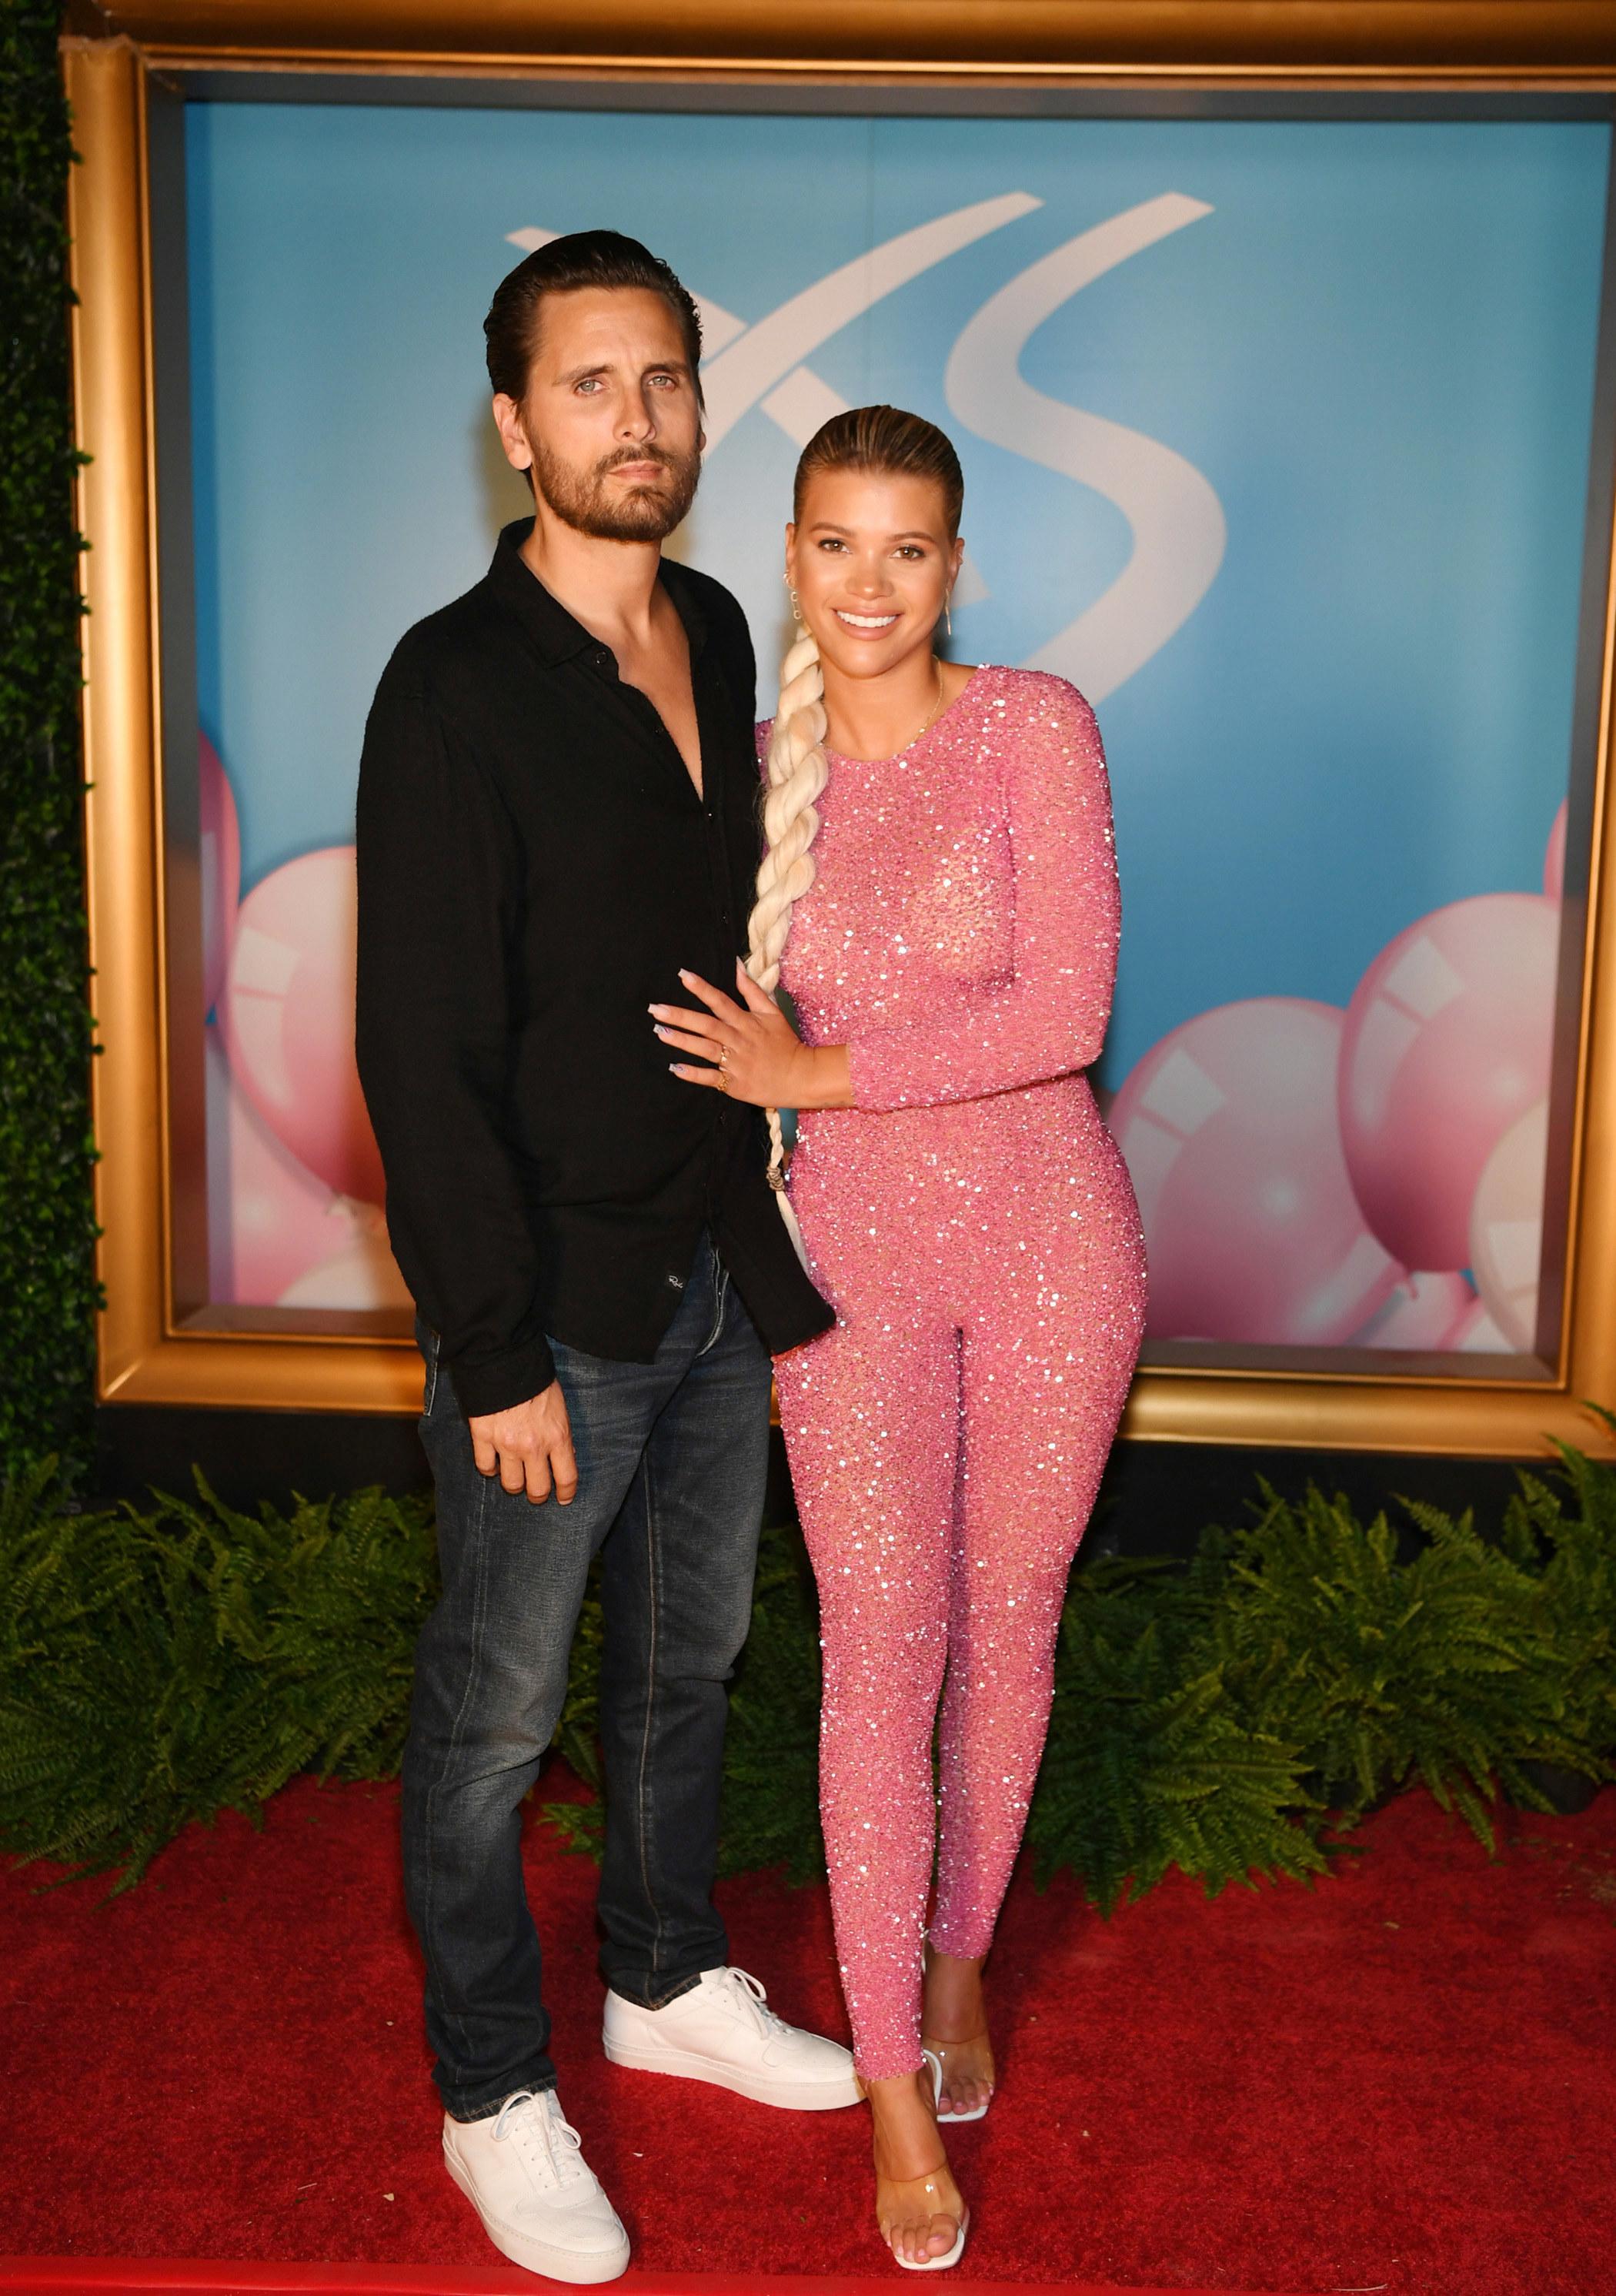 Scott Disick and Sofia Richie arrive at Sophia Richie's 21st birthday celebration at XS Nightclub at Wynn Las Vegas on August 24, 2019 in Las Vegas, Nevada